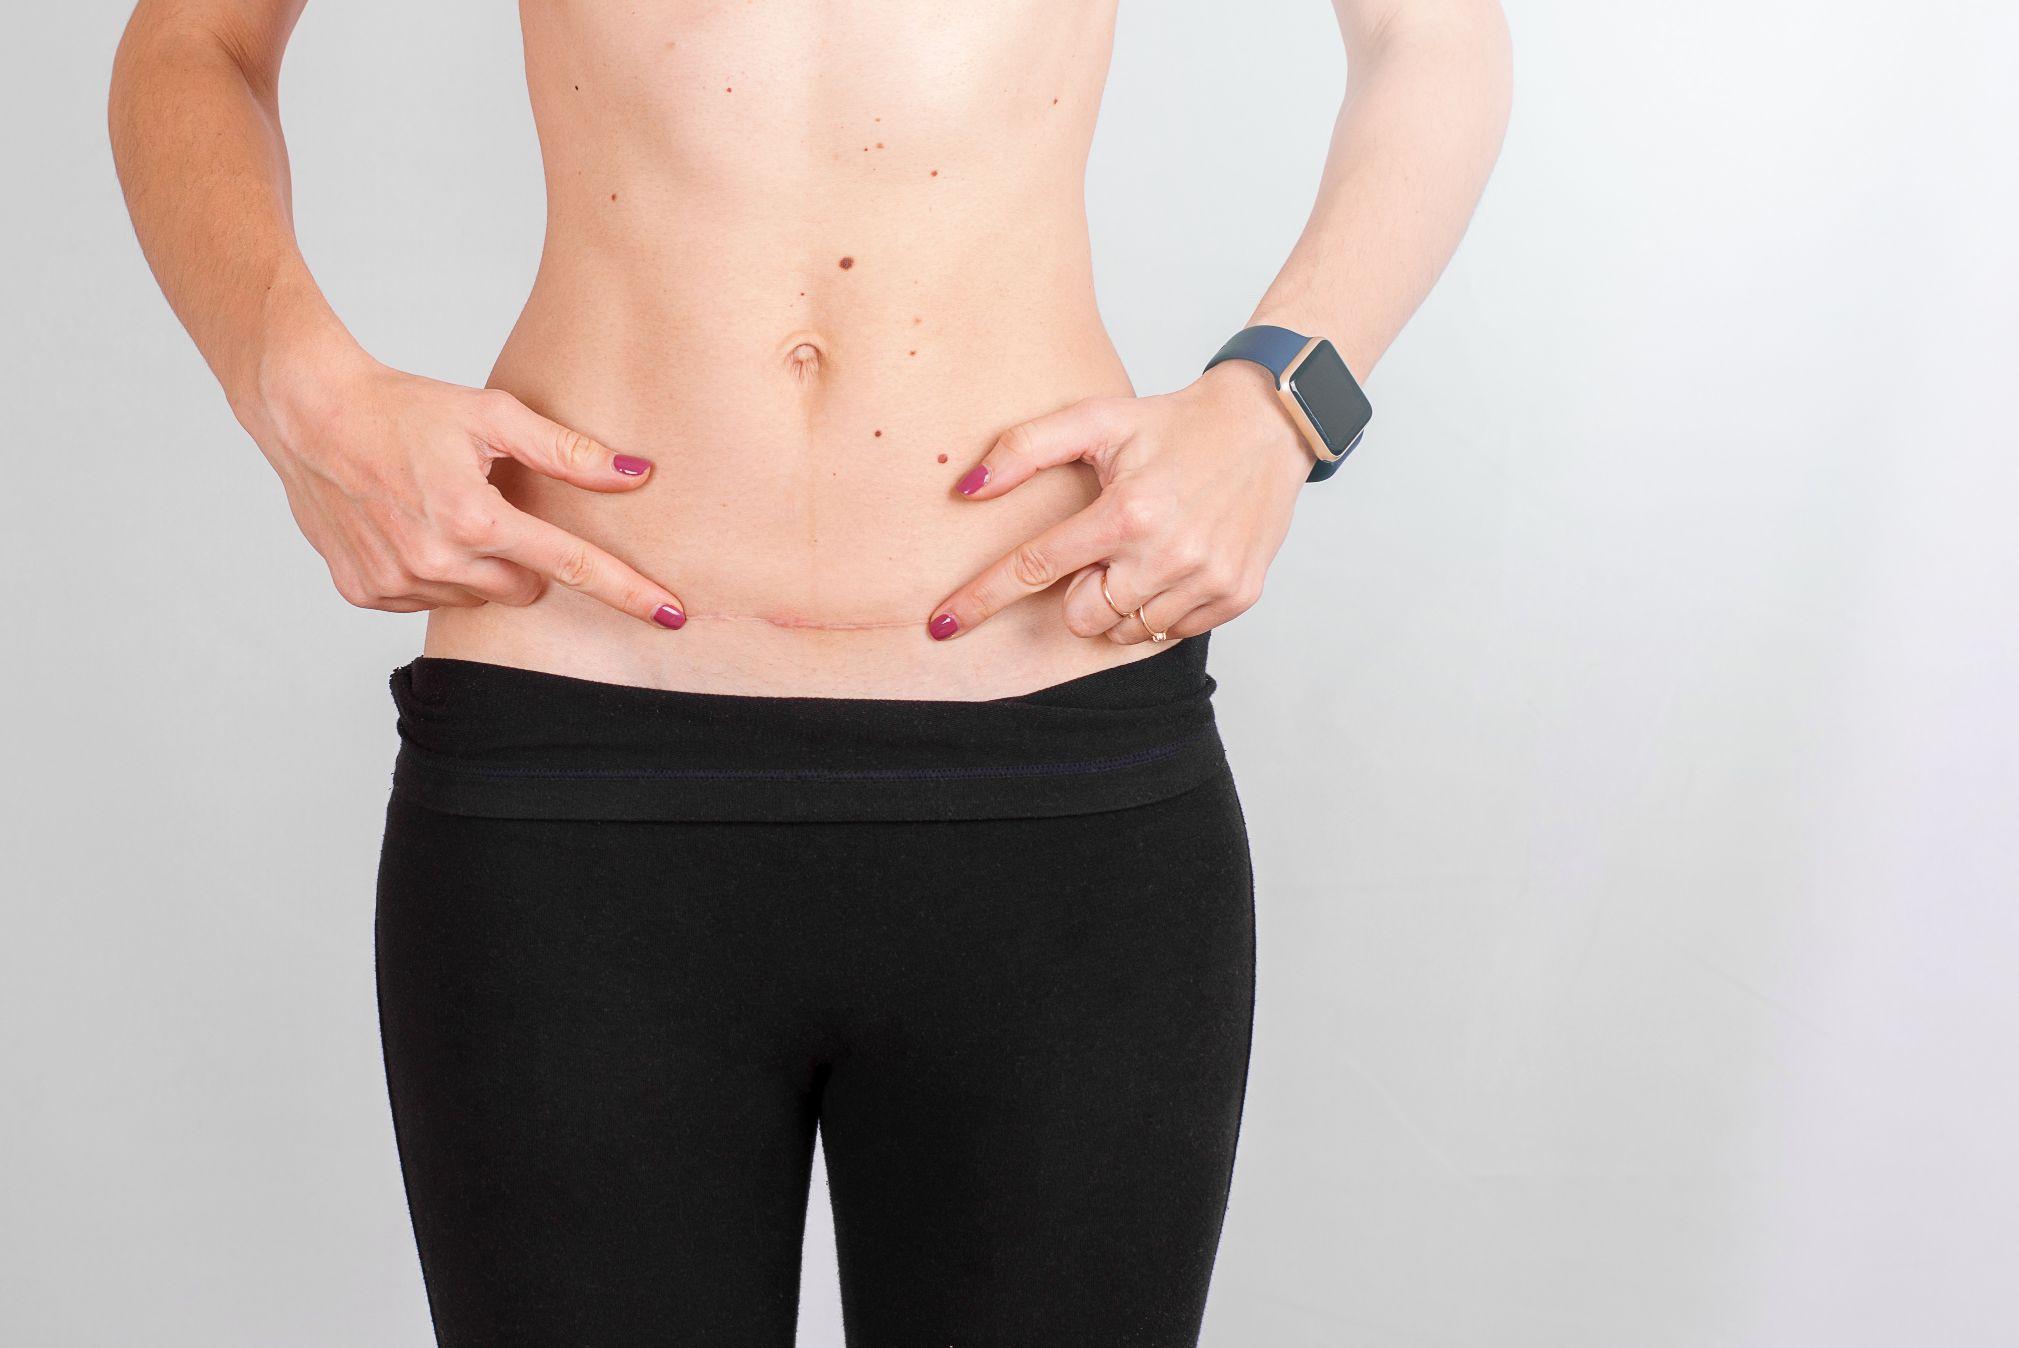 Estética 21 - Centro de estética avanzada - Camuflaje cosmético para las cicatrices - mujer estrias cicatriz cesárea